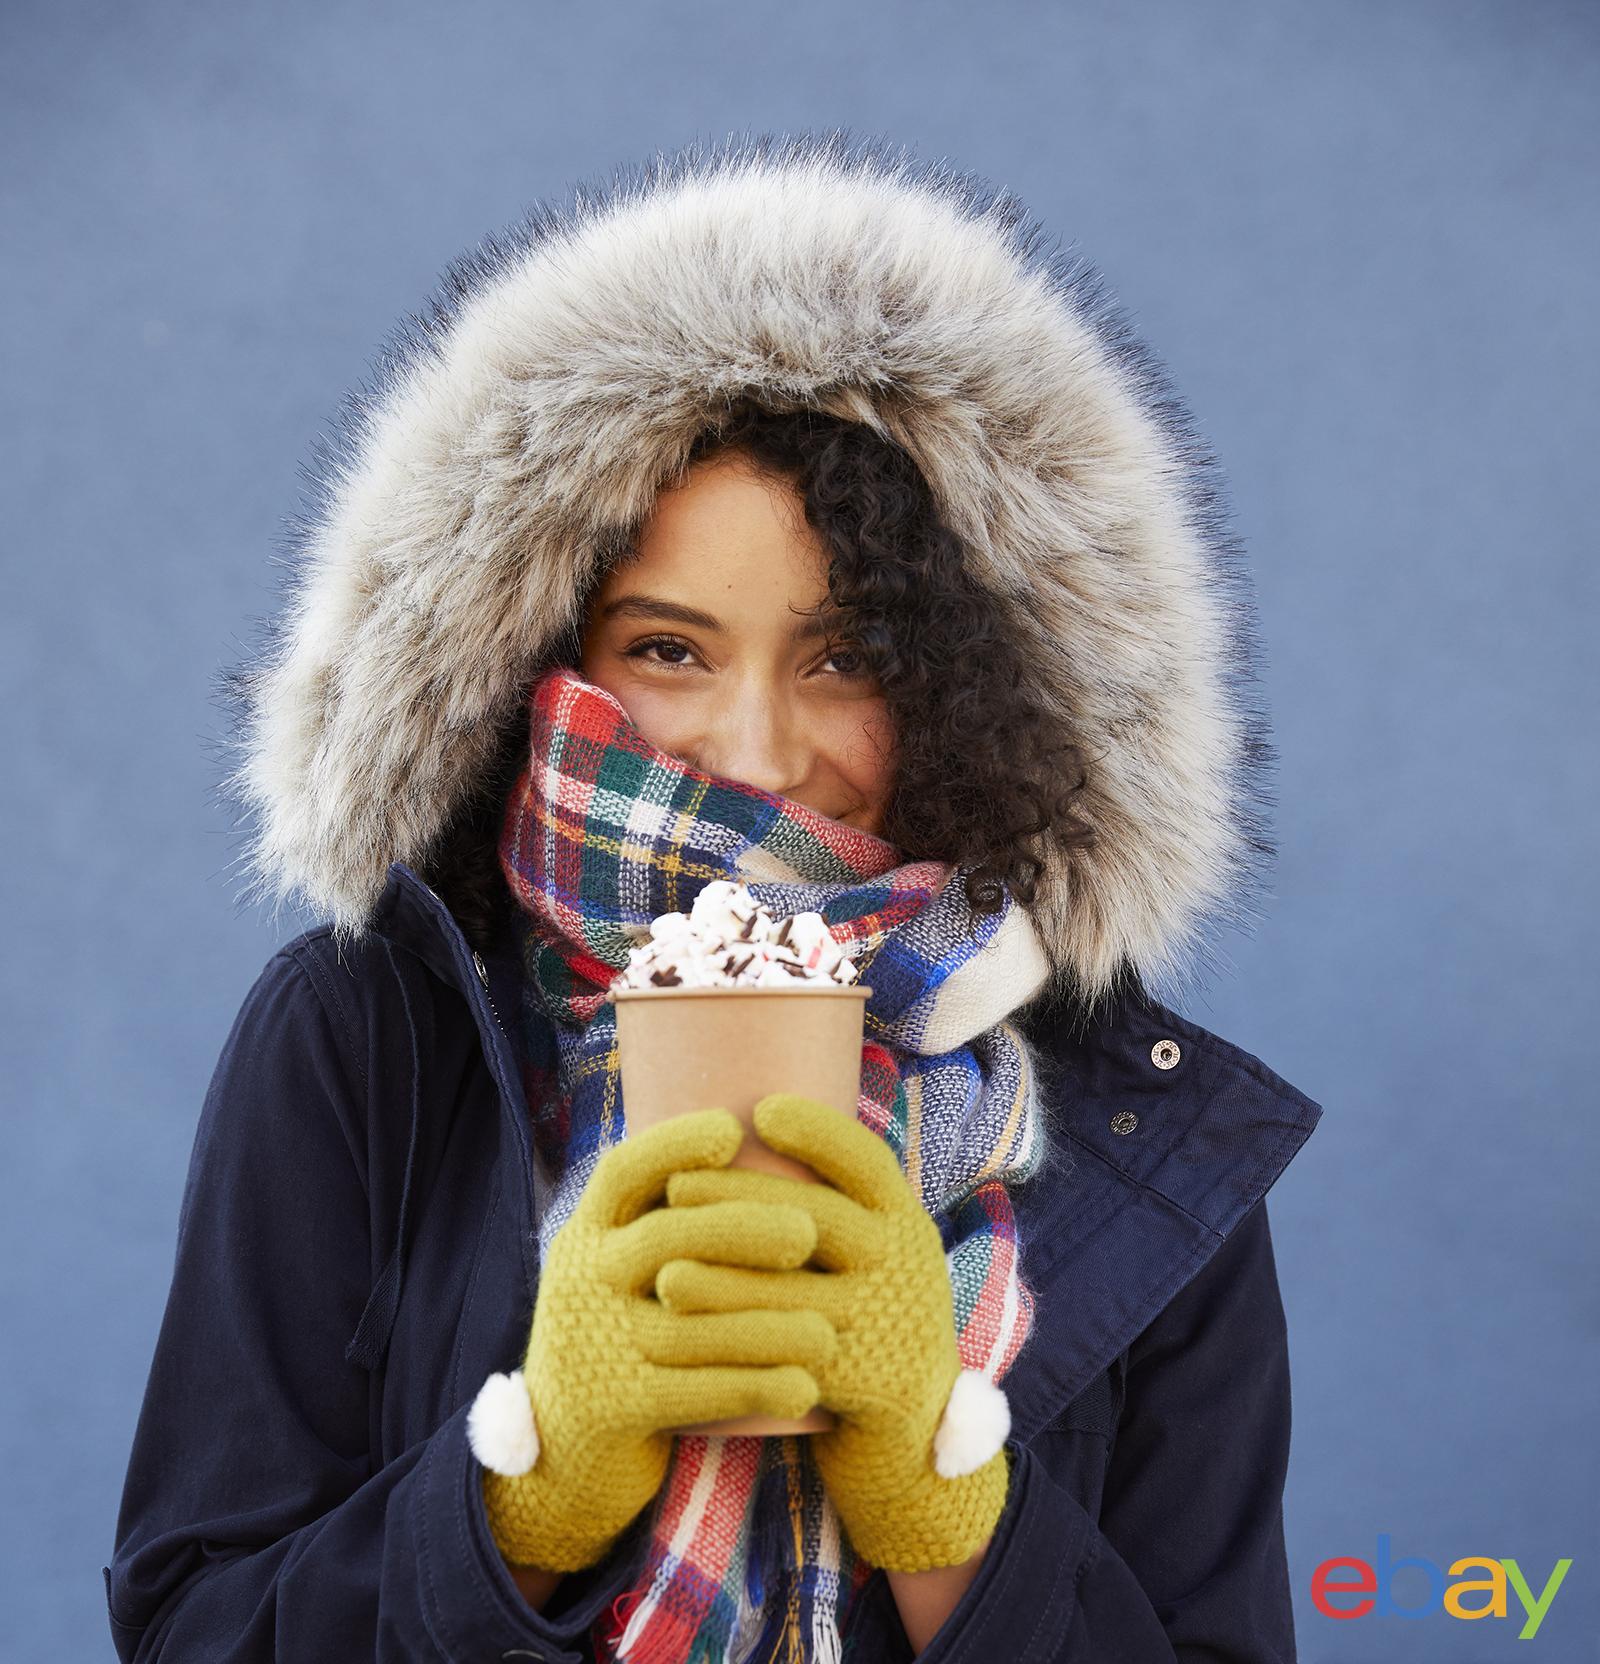 EBAY_Fashion_Social_Outerwear_192 copy copy.jpg